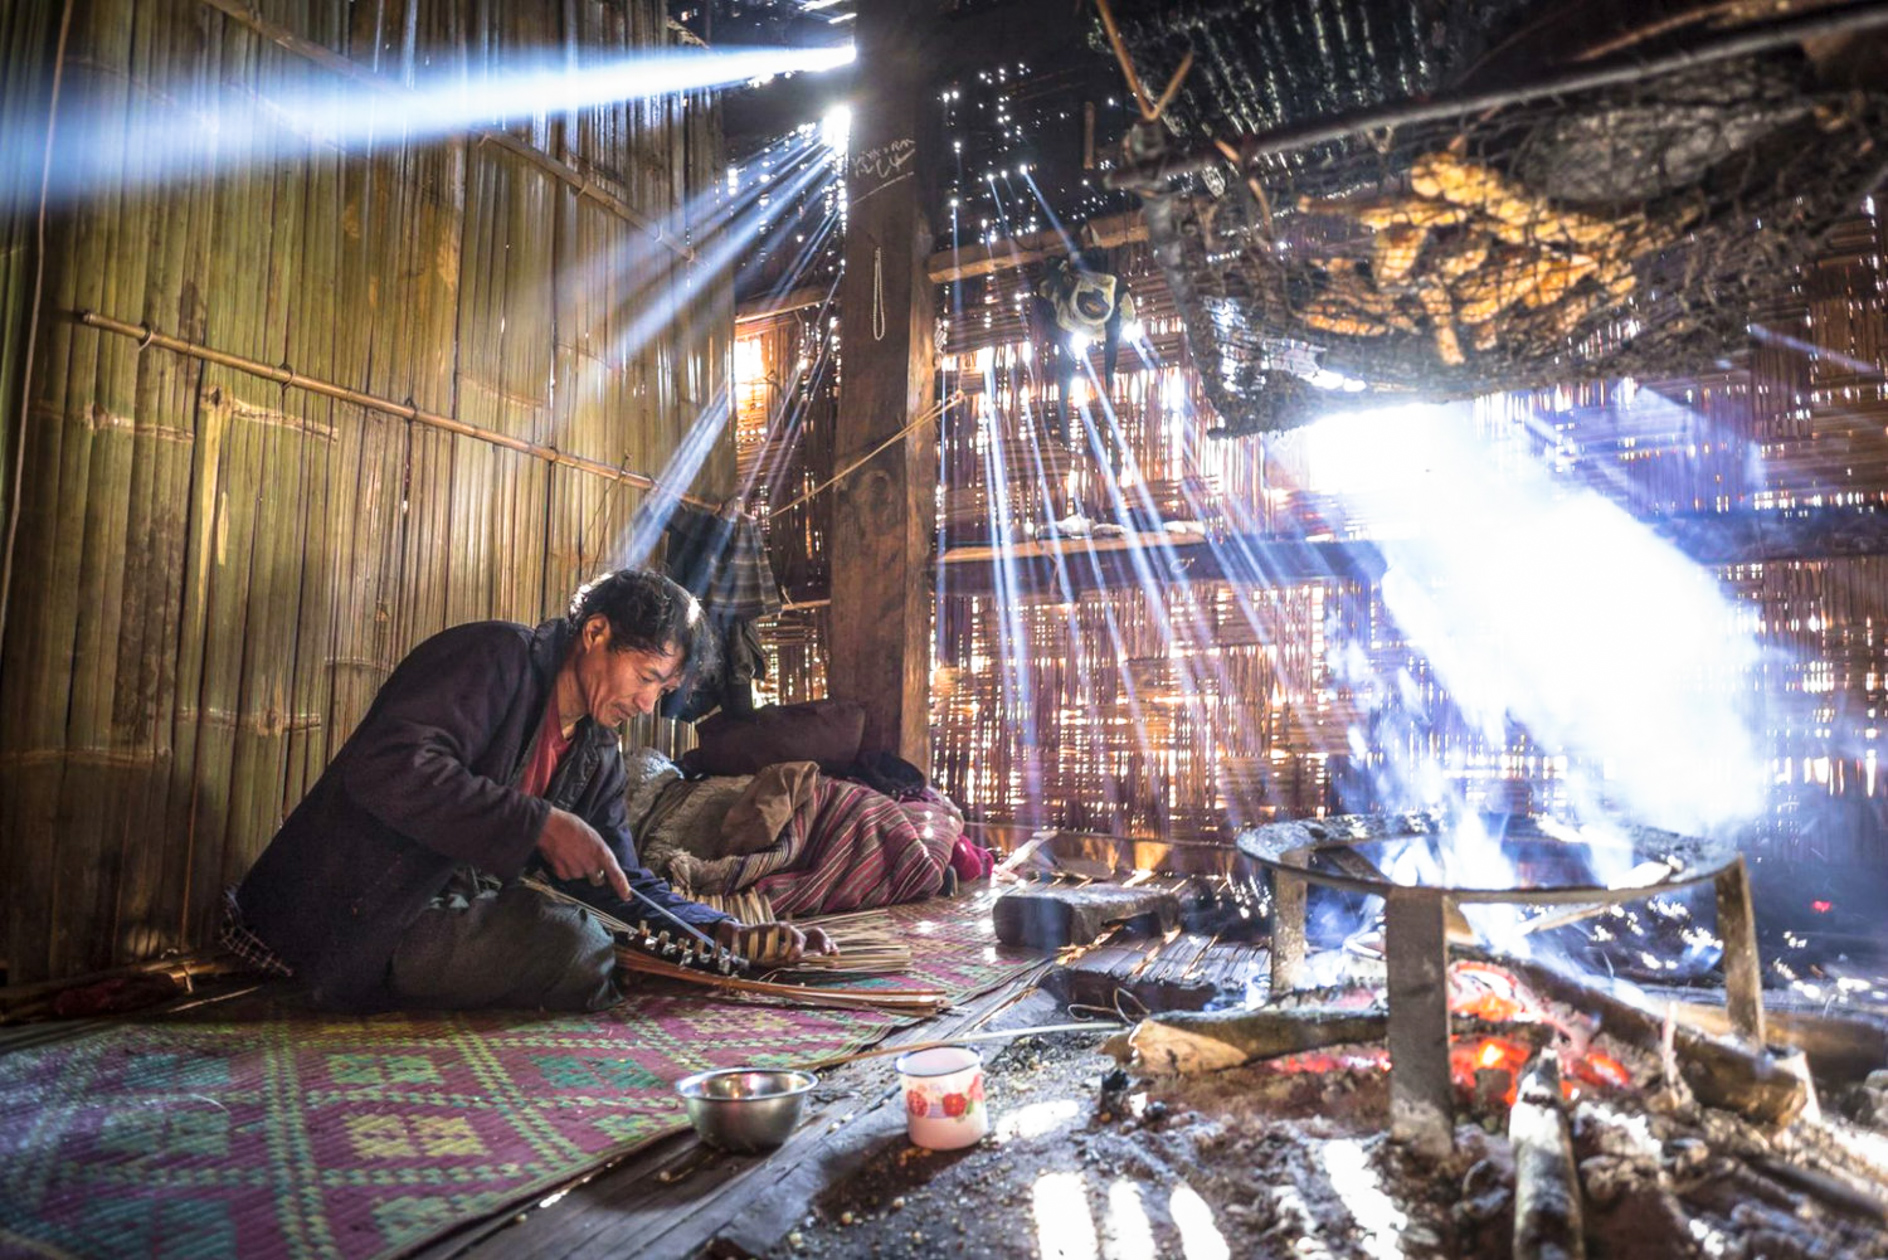 Cory-Richards-Photographer-Burma.jpg